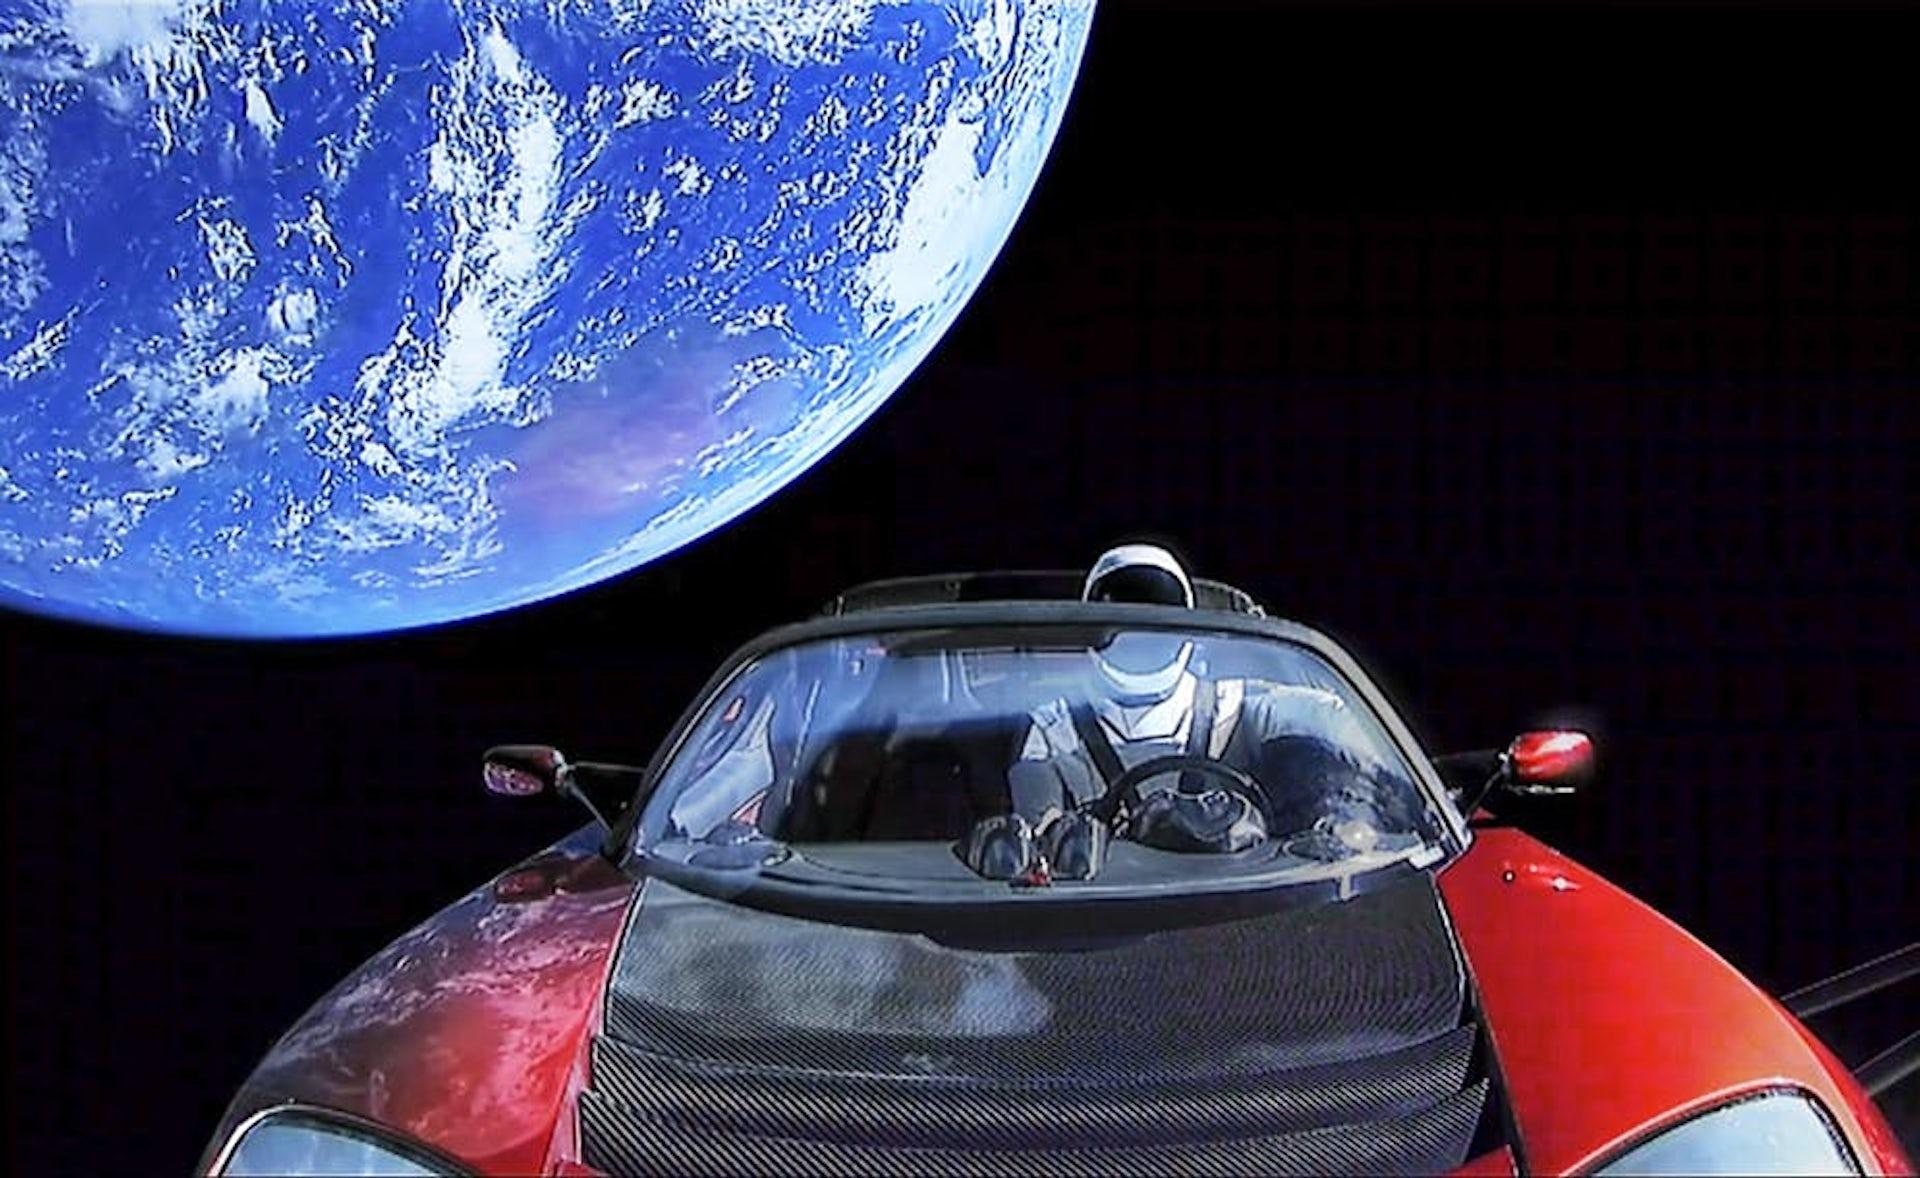 Tesla Motors The Martian Space X Elon Musk Original Interpretation